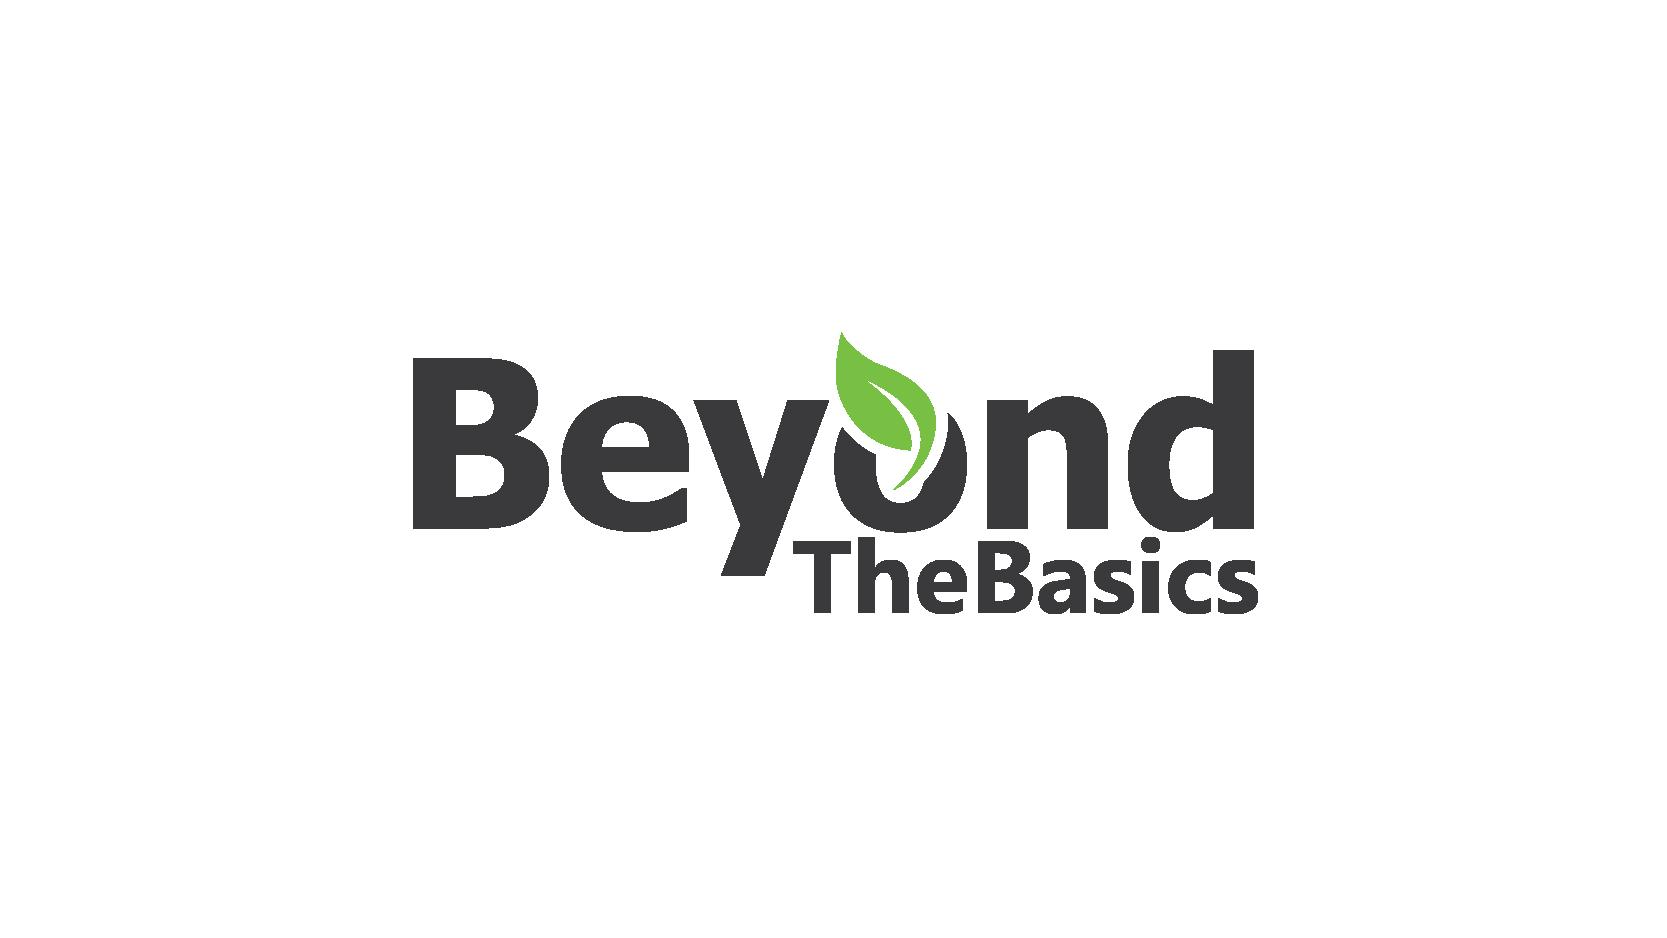 BeyondTheBasics.com